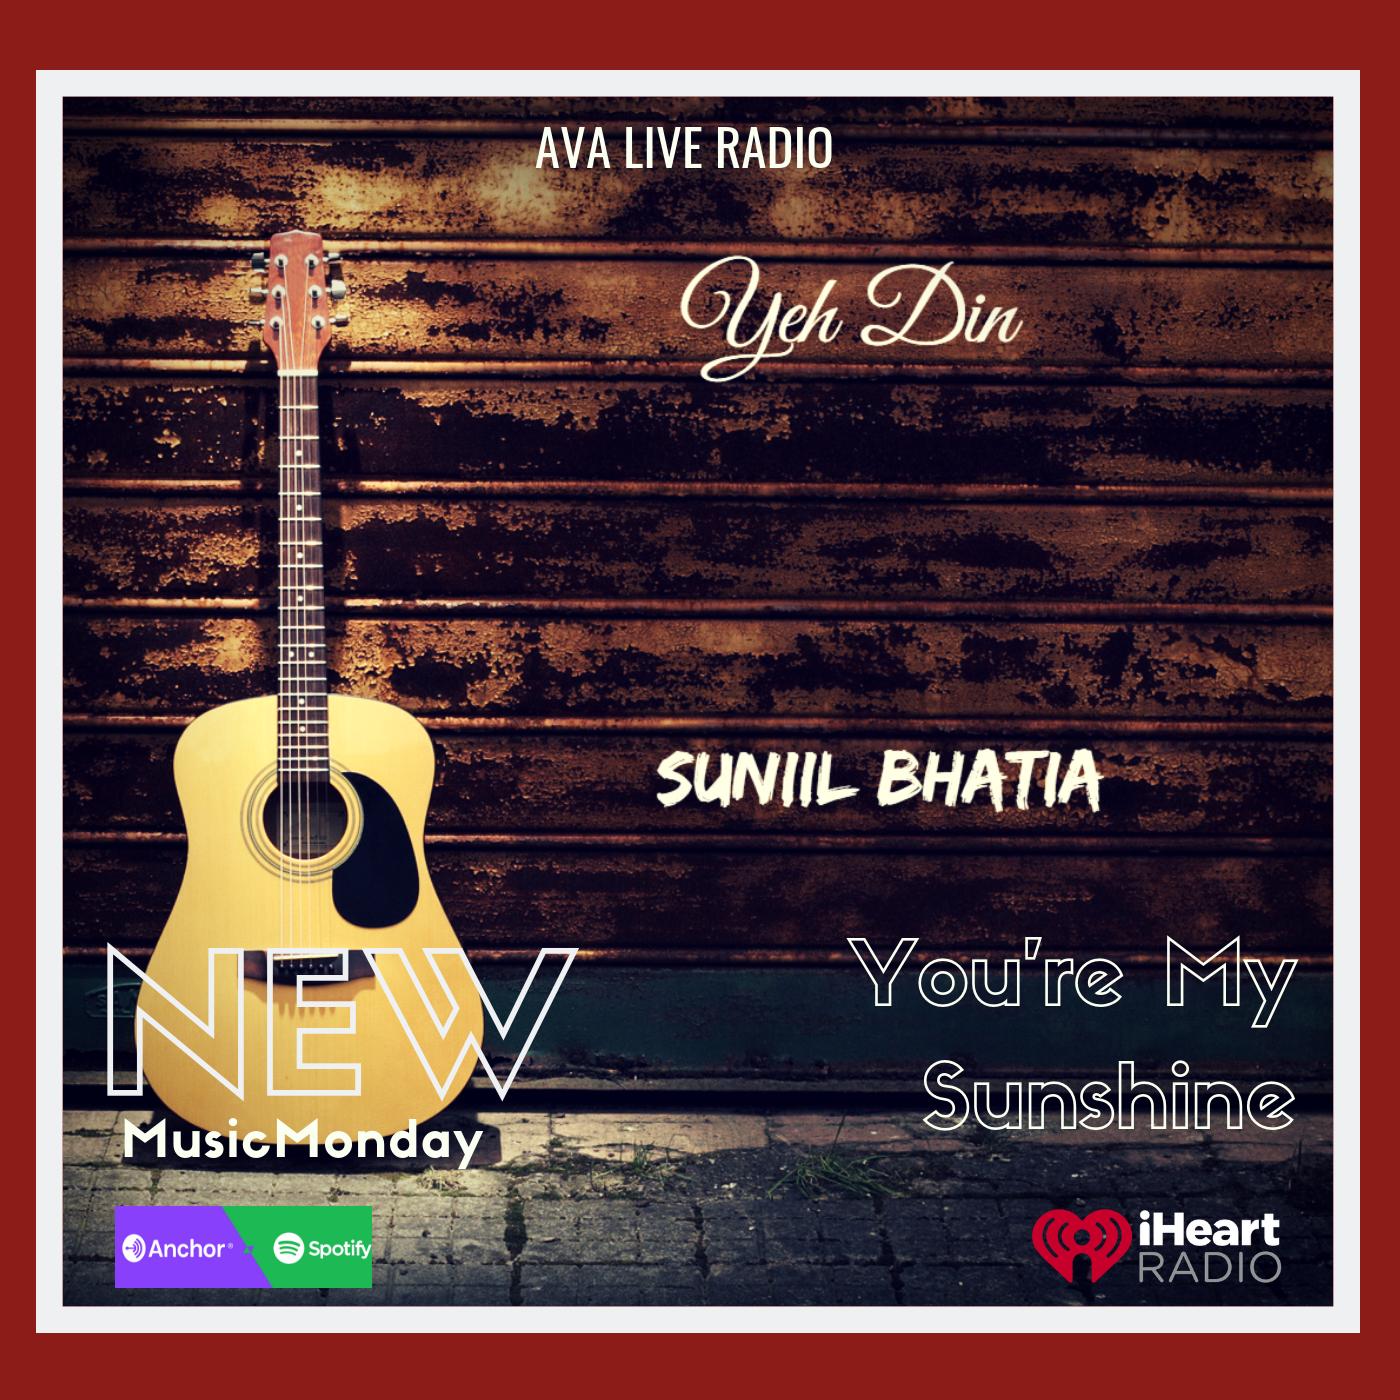 You're My Sunshine Sunil Bhatia avaliveradio.png